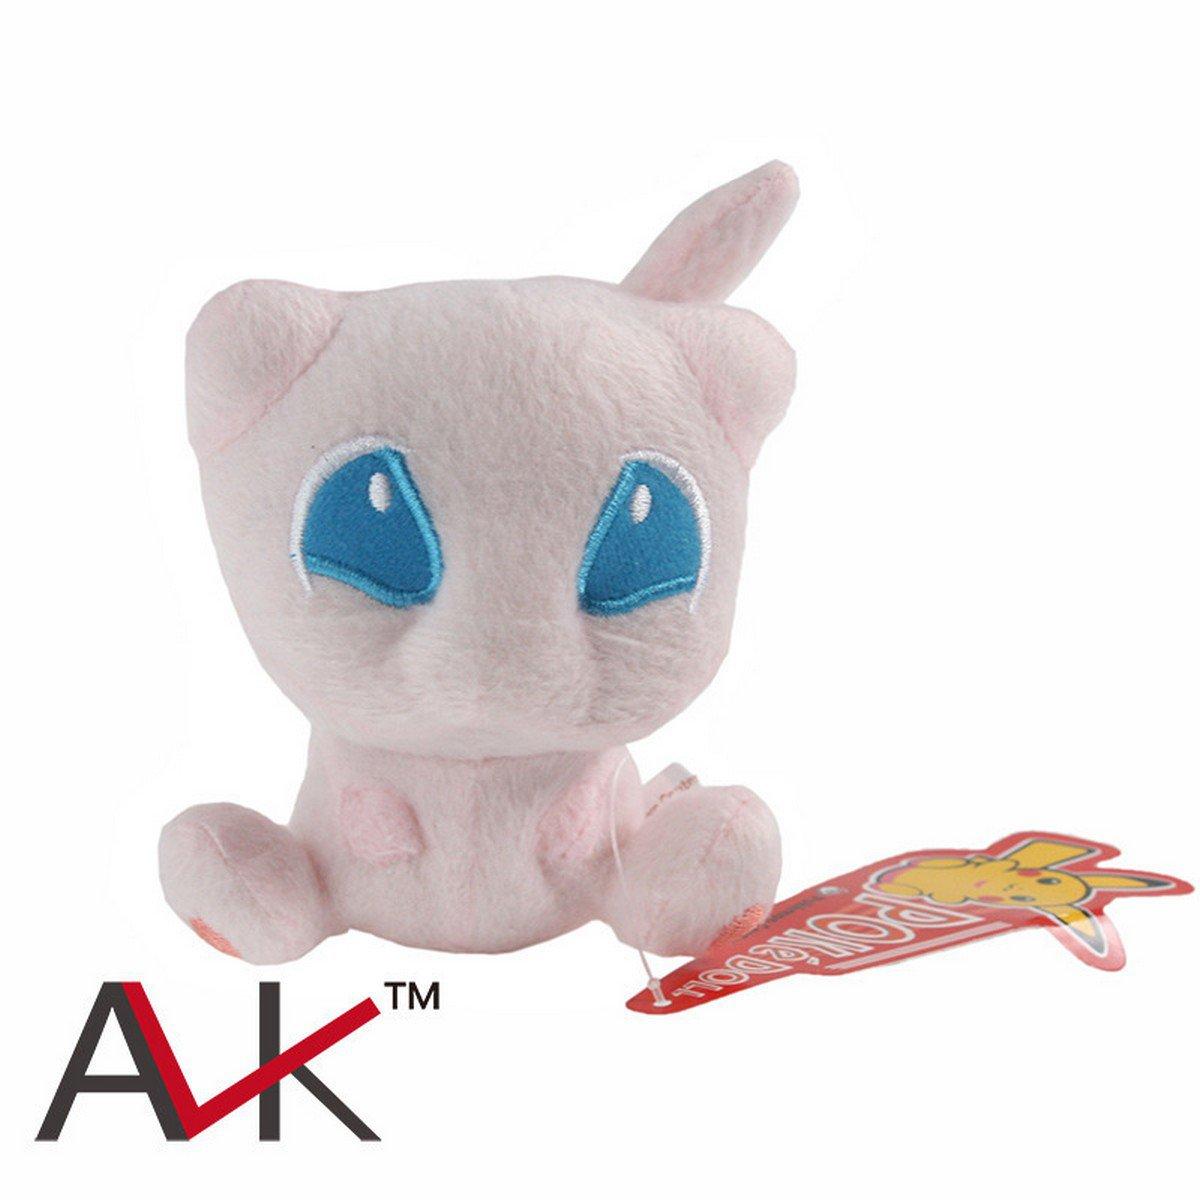 Buy 2016 New 4style Pokemon 12cm Size Pikachu  Bulbasaur  Squirtle  Charmander Big Head Cute kawaii